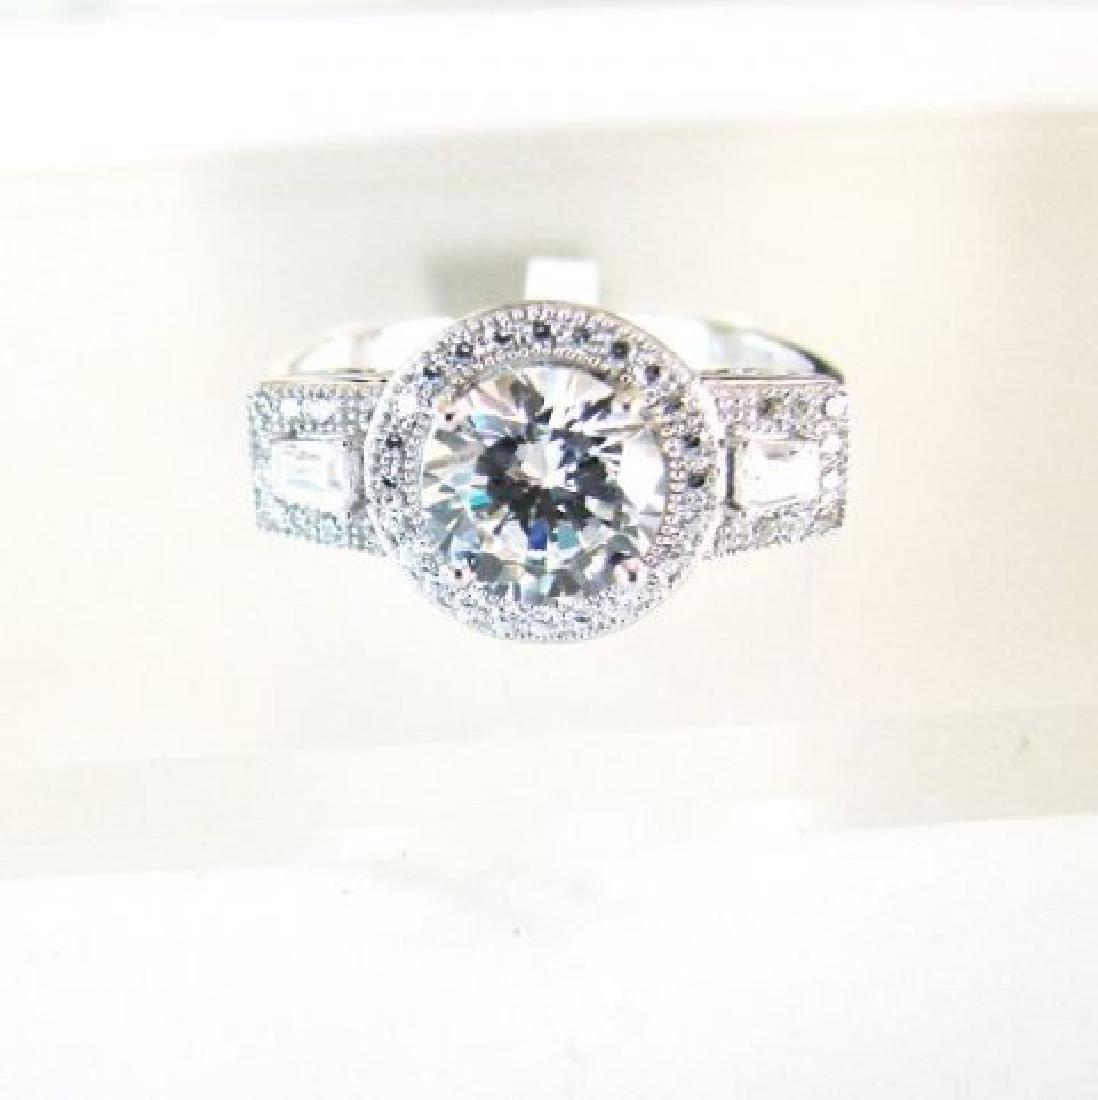 Creation Diamond-Ring 2.75Ct 18k W/g Overlay